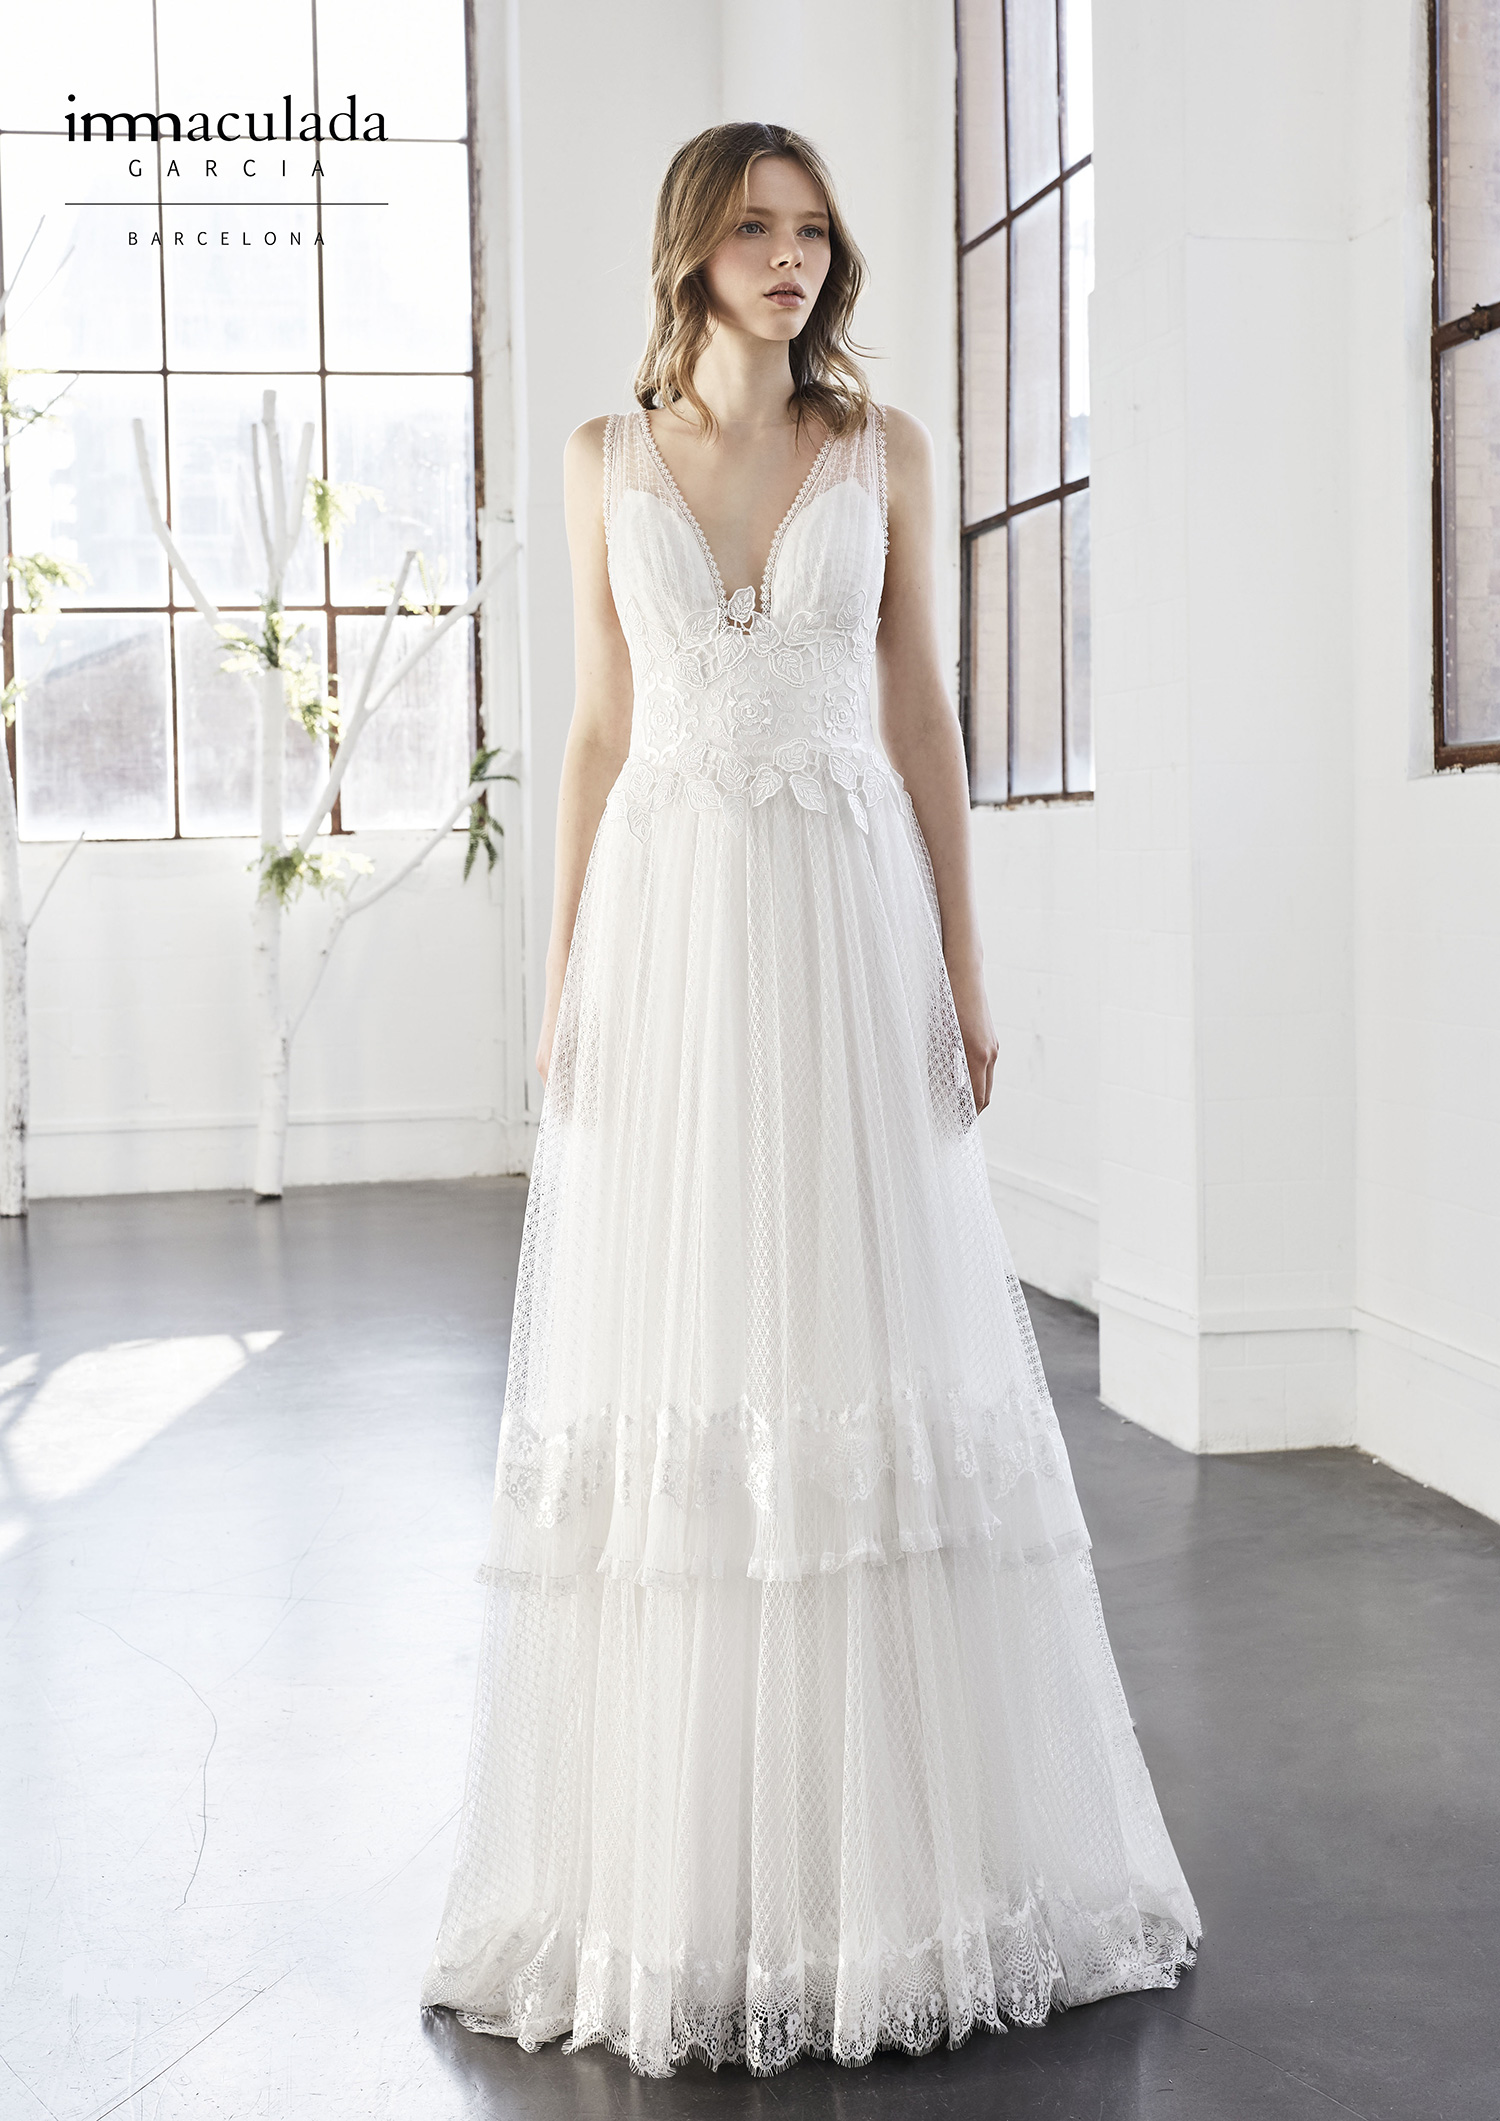 Anche Nel 2018 La Sposa è Boho Chic Fleur De Lys Atelier Sposa